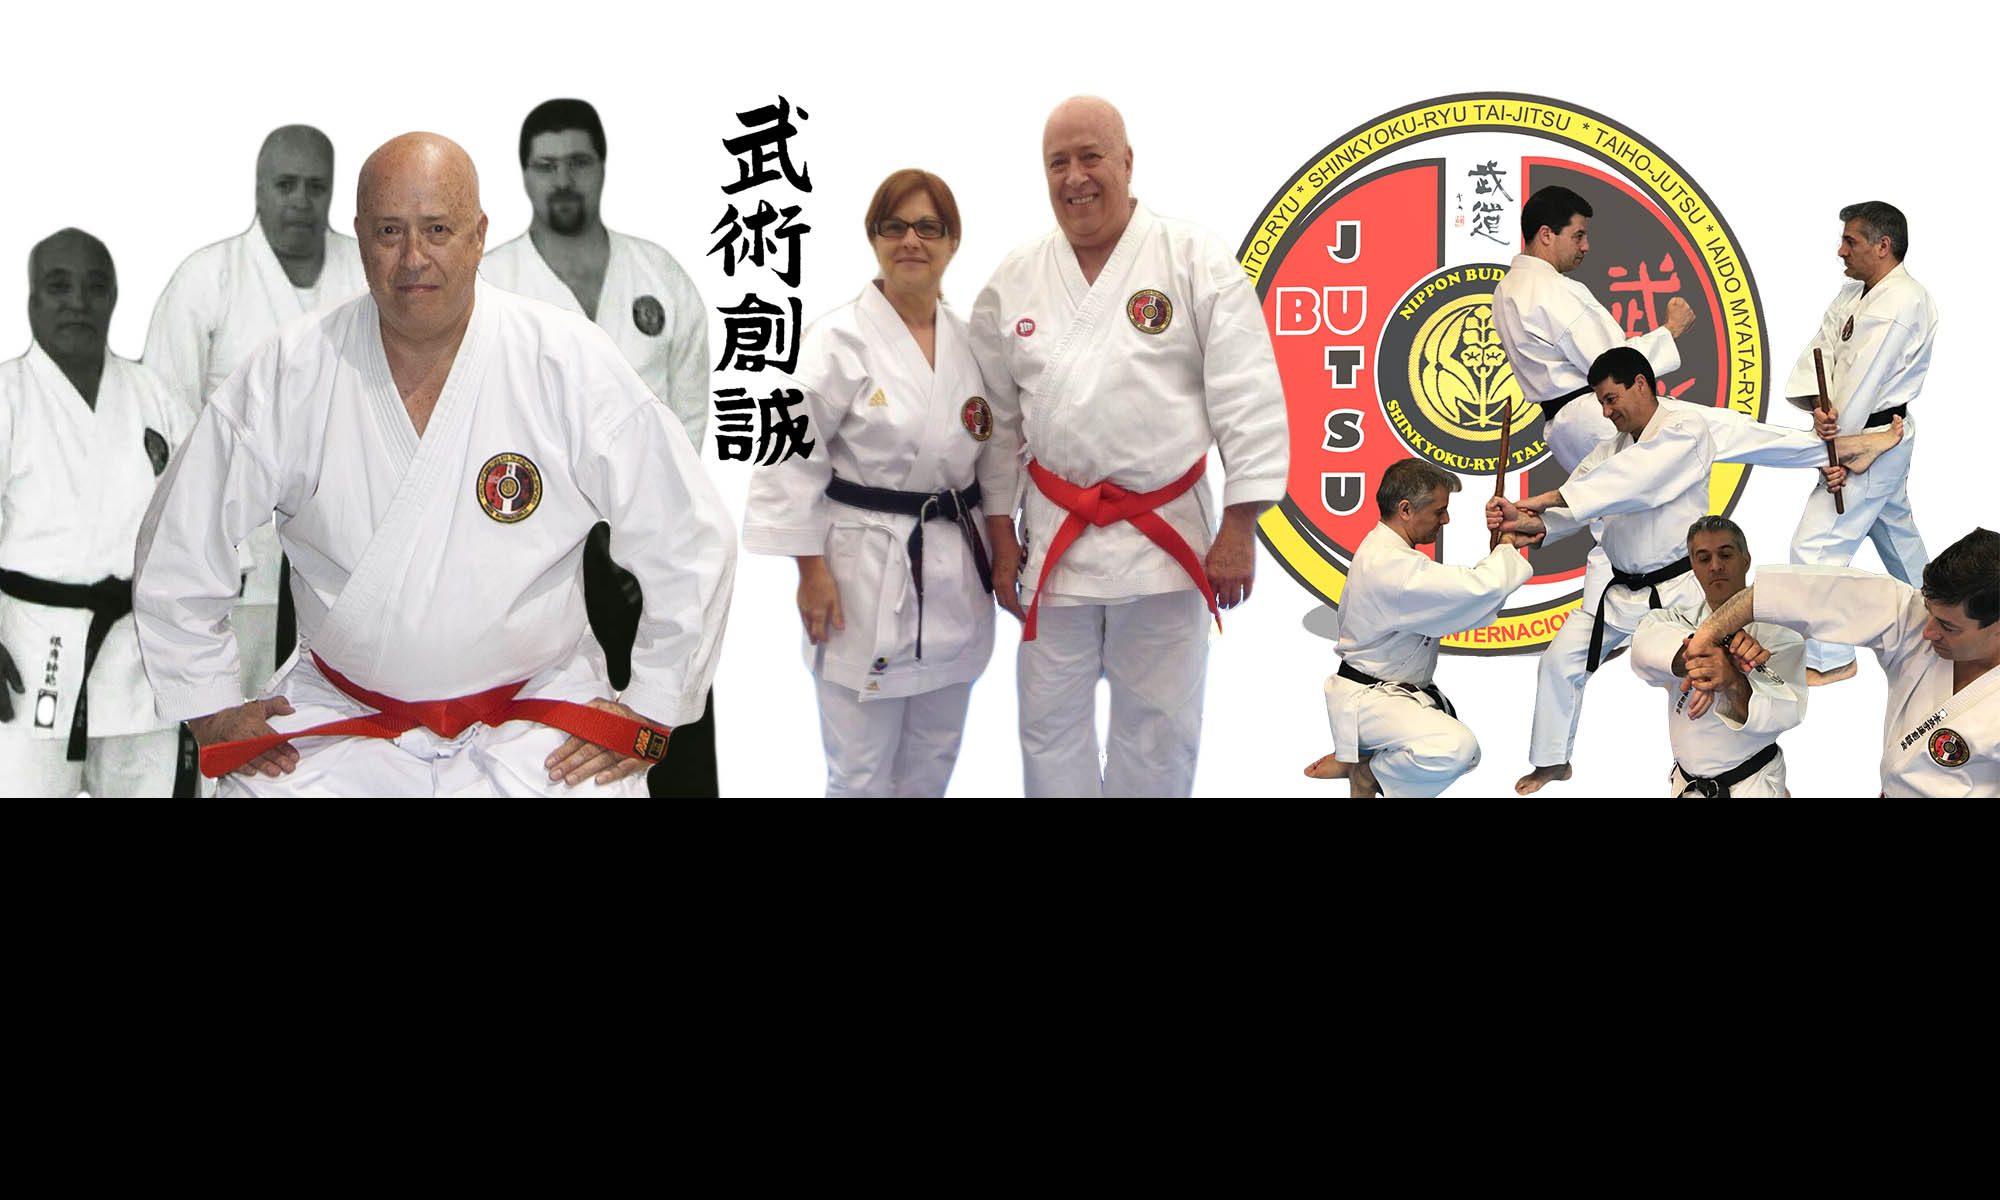 Bujutsu Sosei Internacional